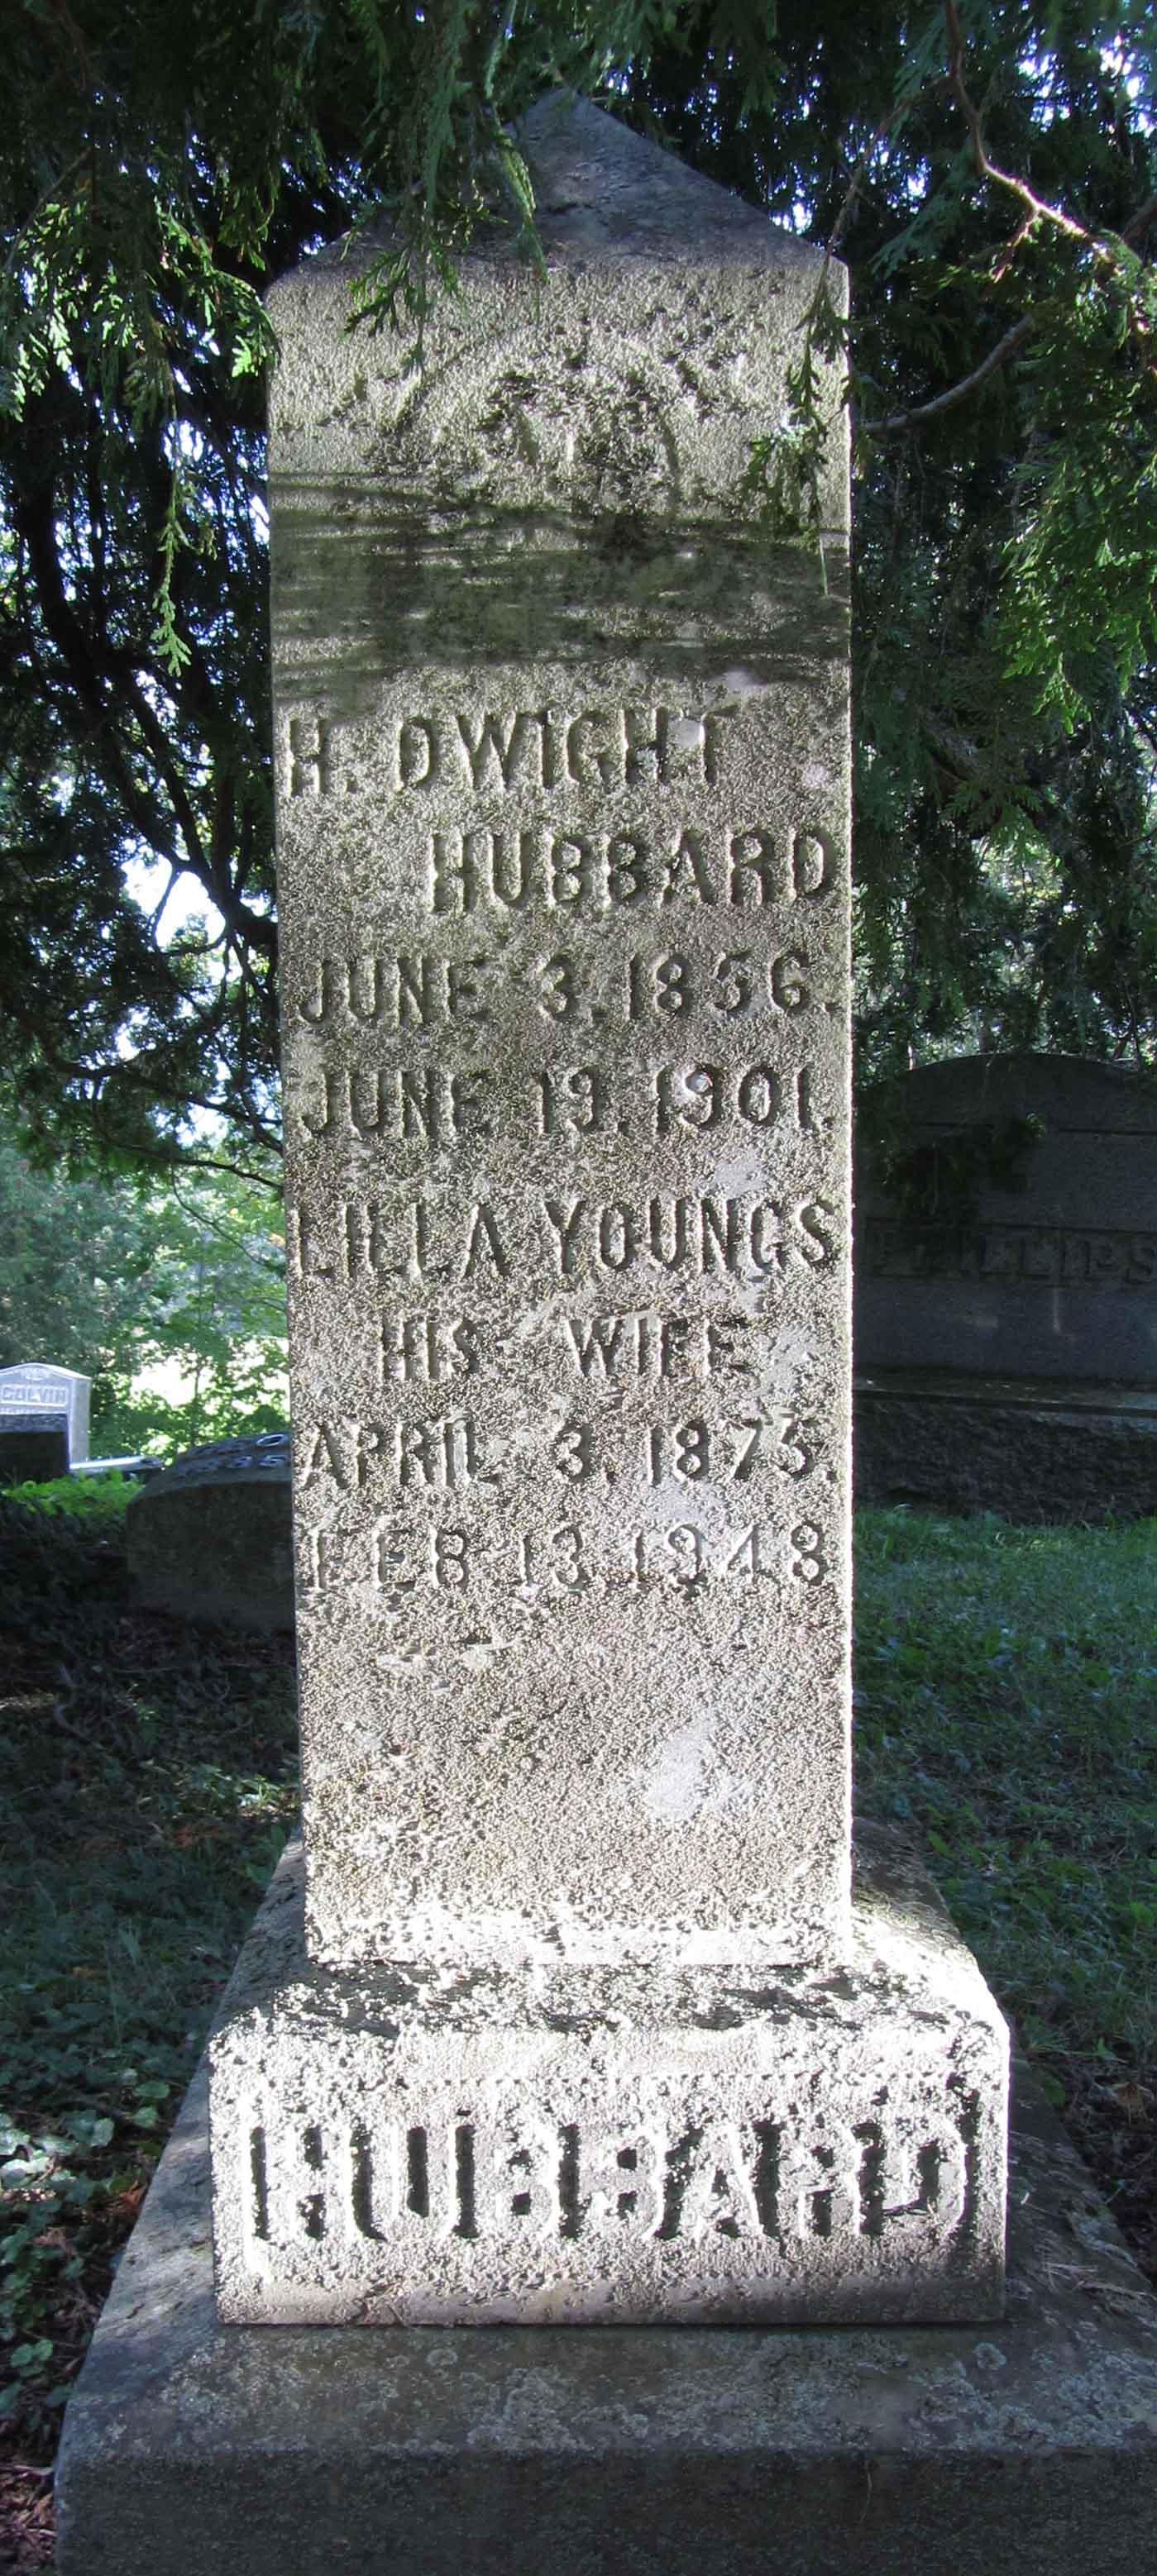 H. Dwight Hubbard